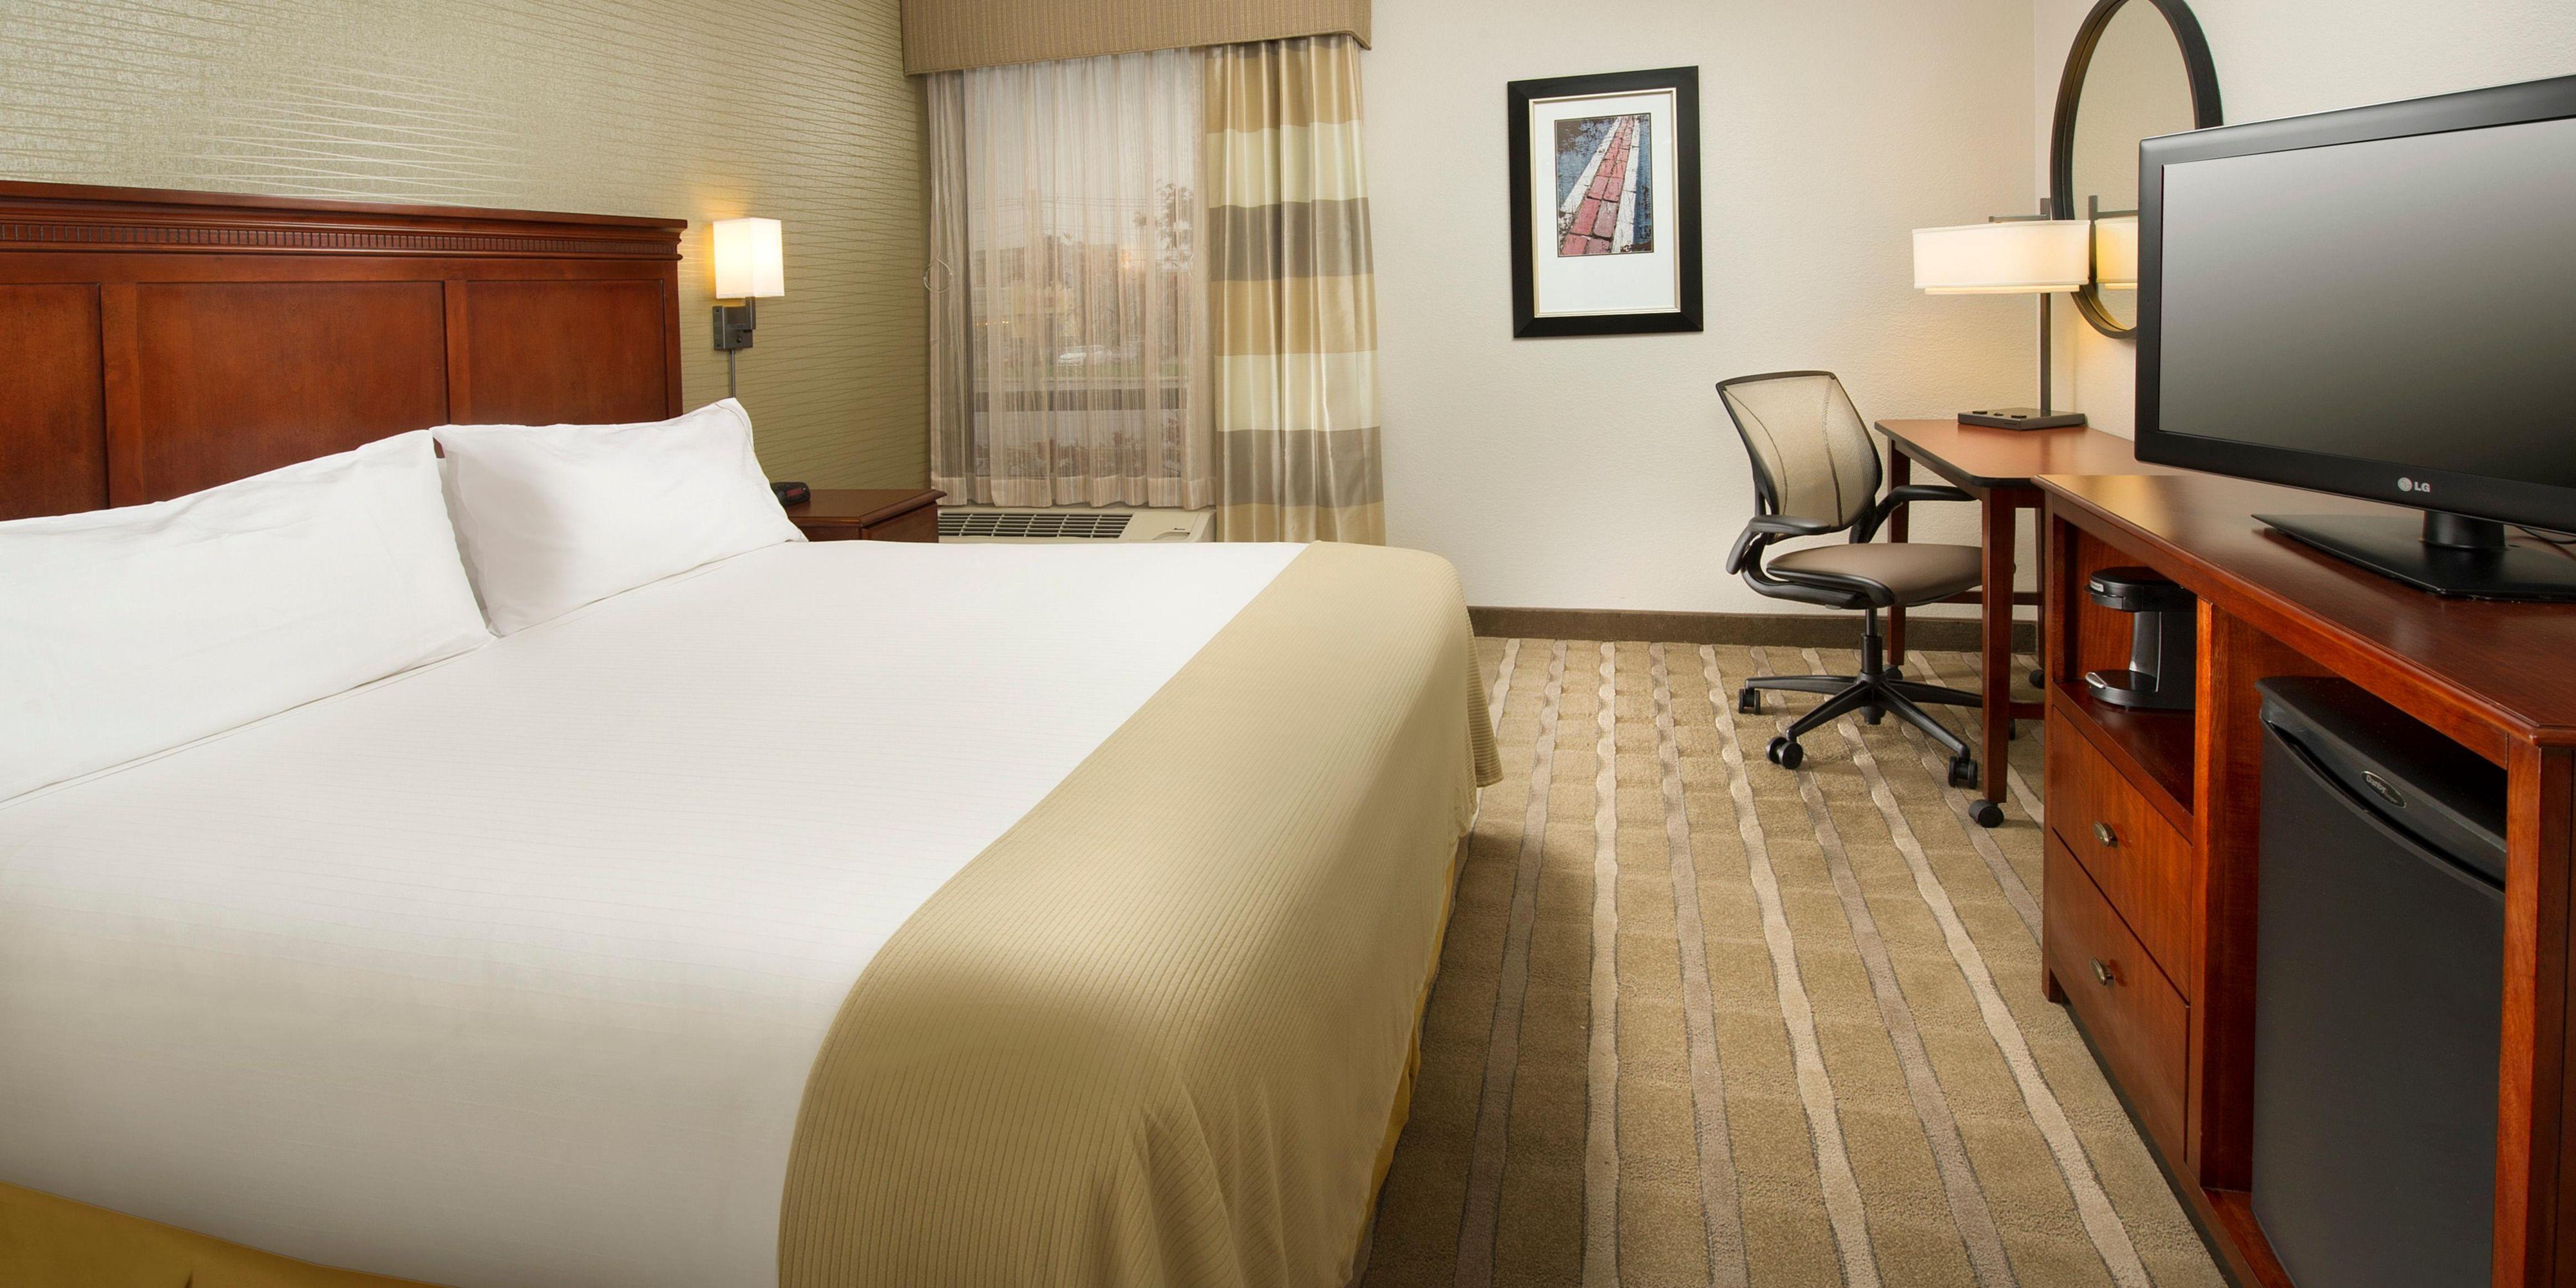 Holiday Inn Express Woburn 3281354201 2x1